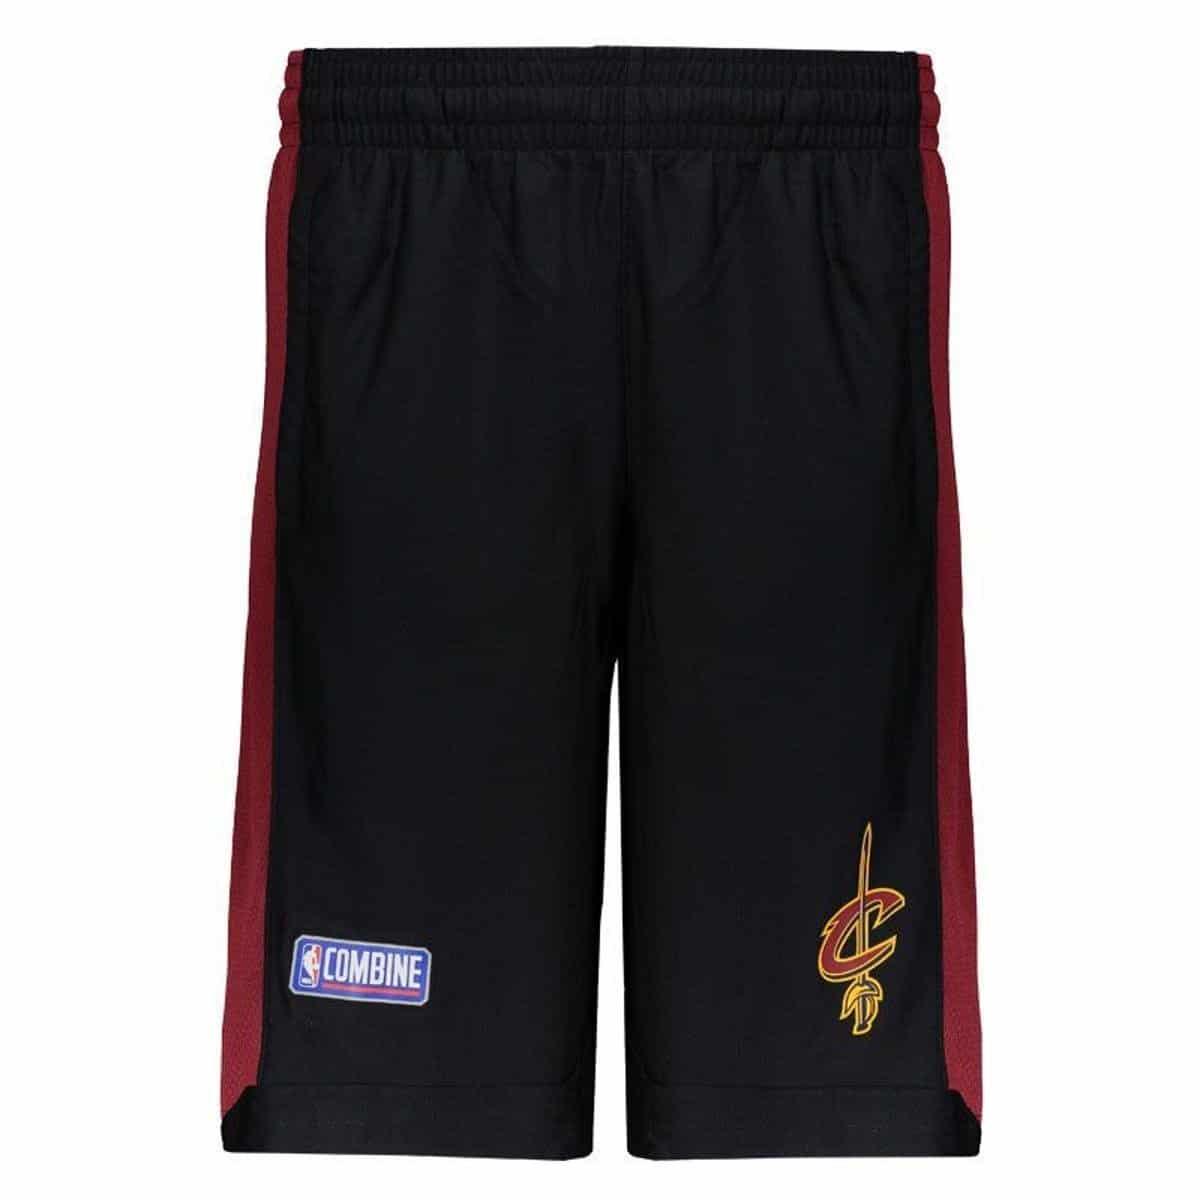 Bermuda do Cleveland Cavaliers